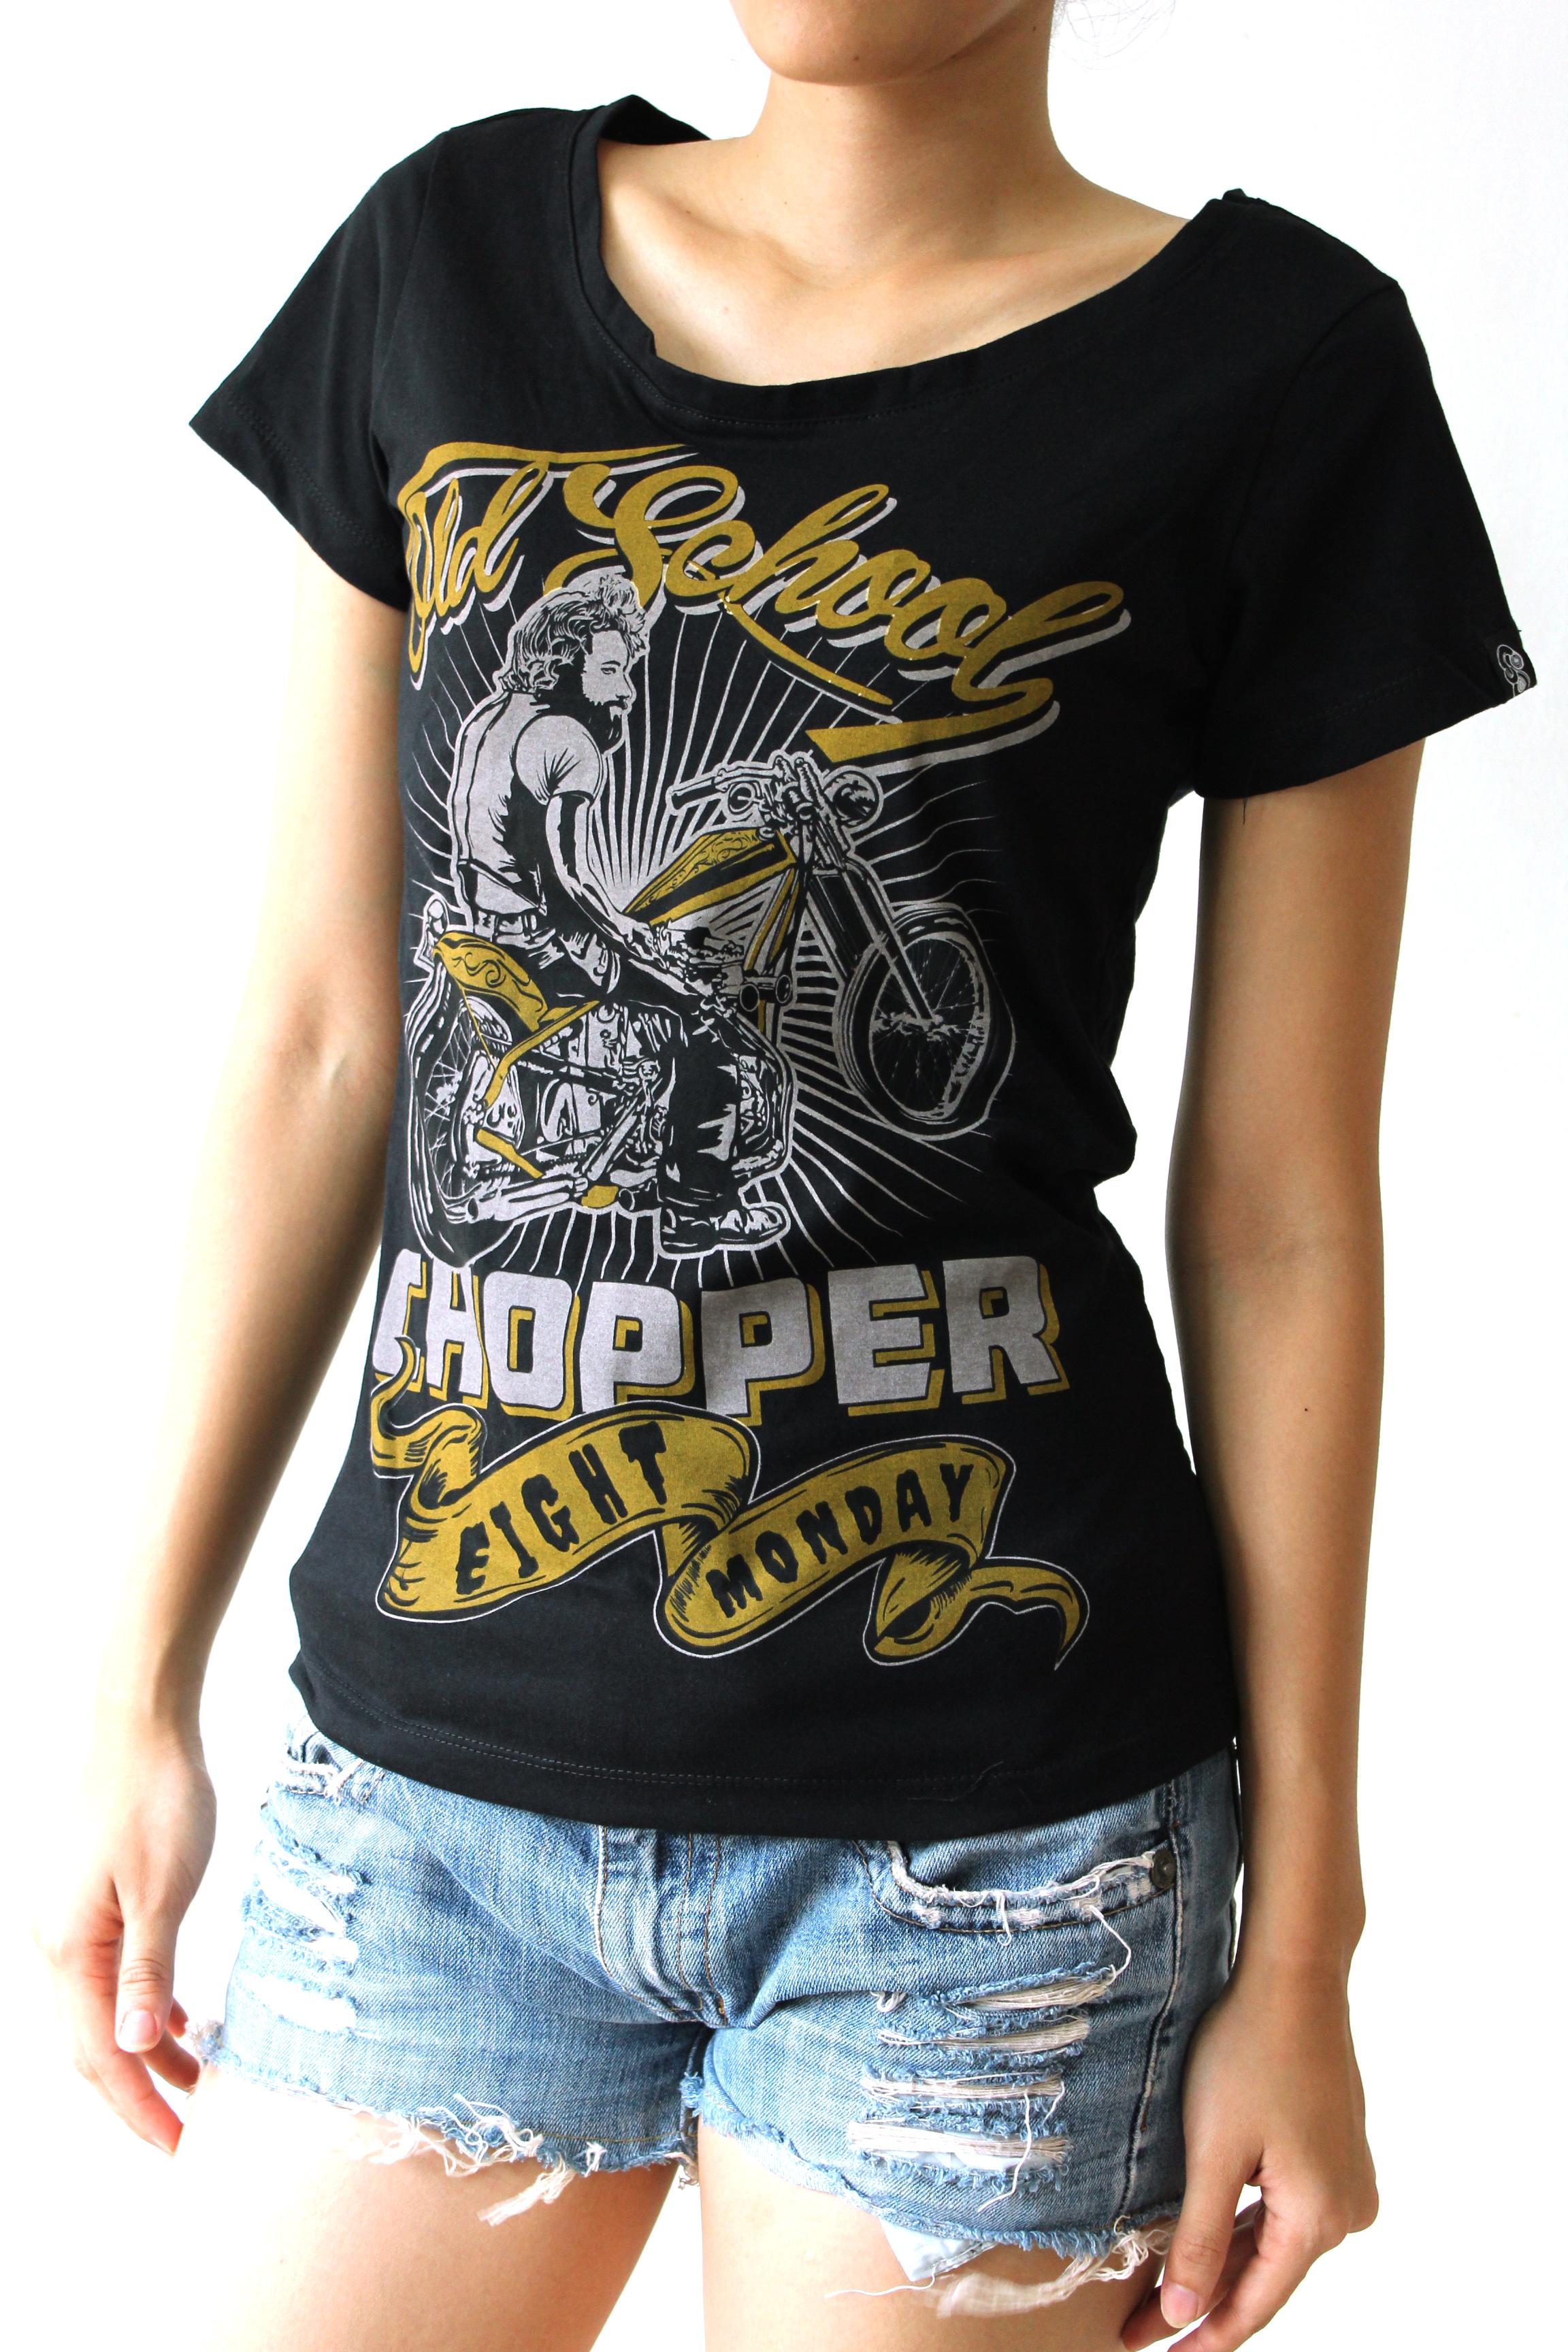 eight_monday_rockabilly_vintage_cafe_racer_west_coast_chopper_motorcycle_25_t_shirts_3.jpg